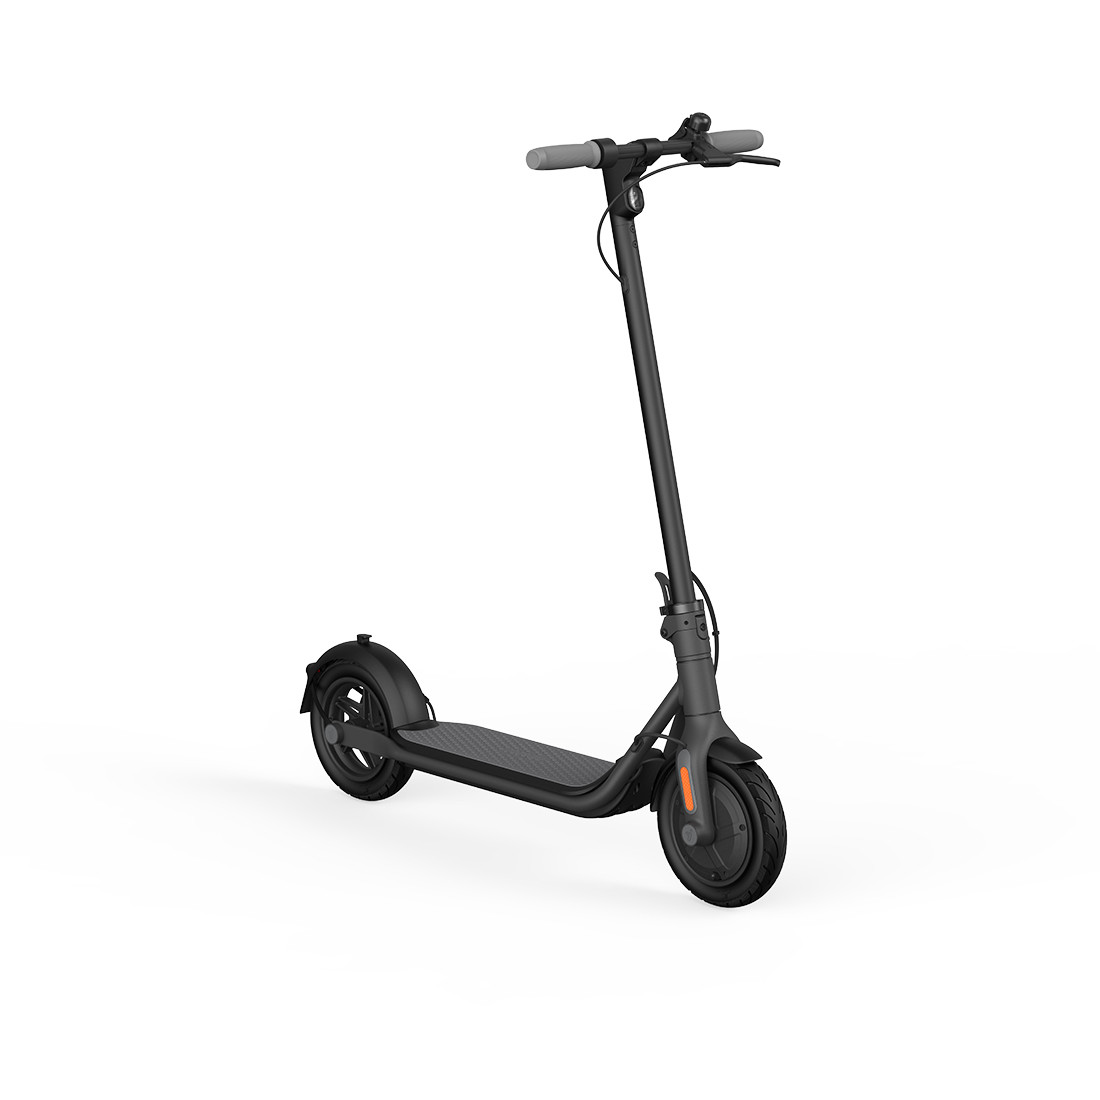 Электросамокат, Электросамокат Xiaomi MiJia Smart Electric Scooter 1S